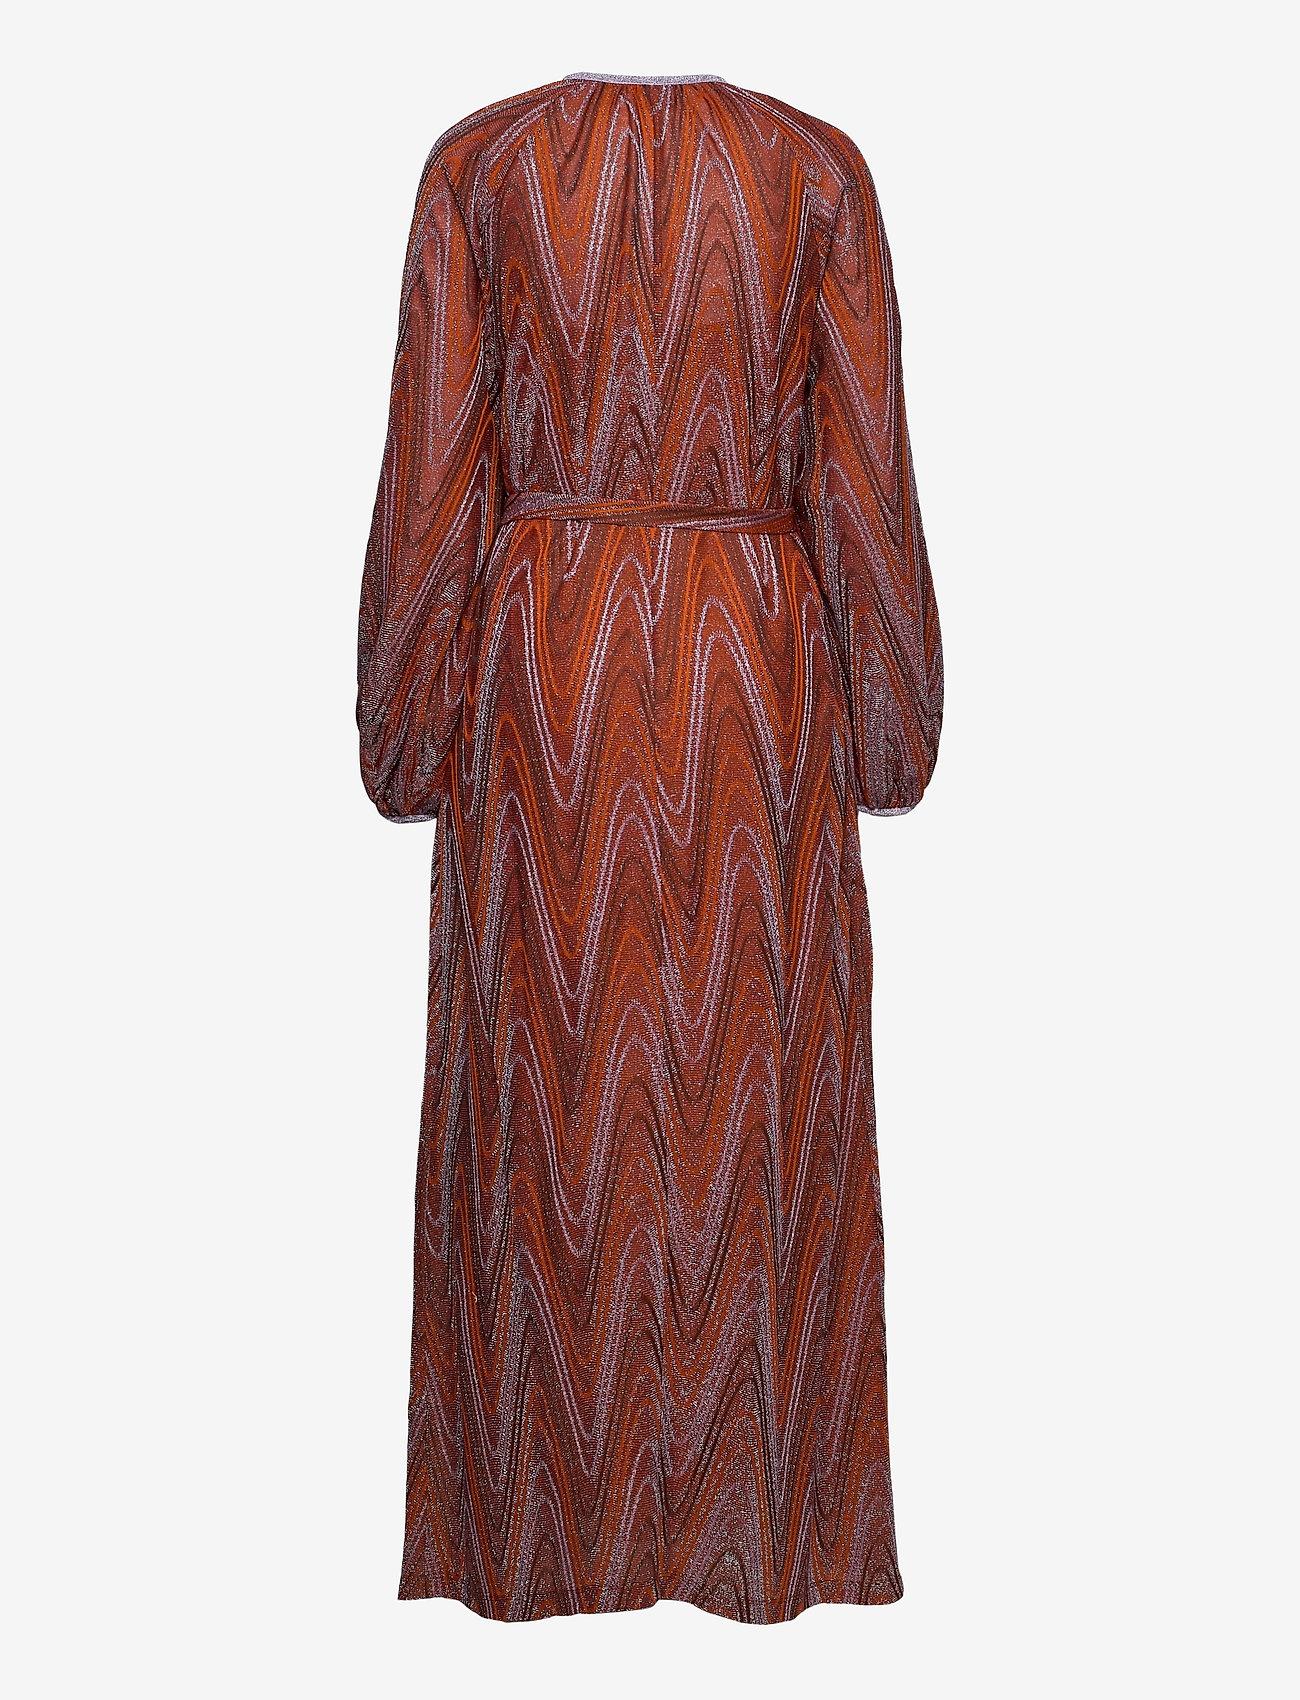 M Missoni - M MISSONI-LONG DRESS - kveldskjoler - tumeric/wood - 1